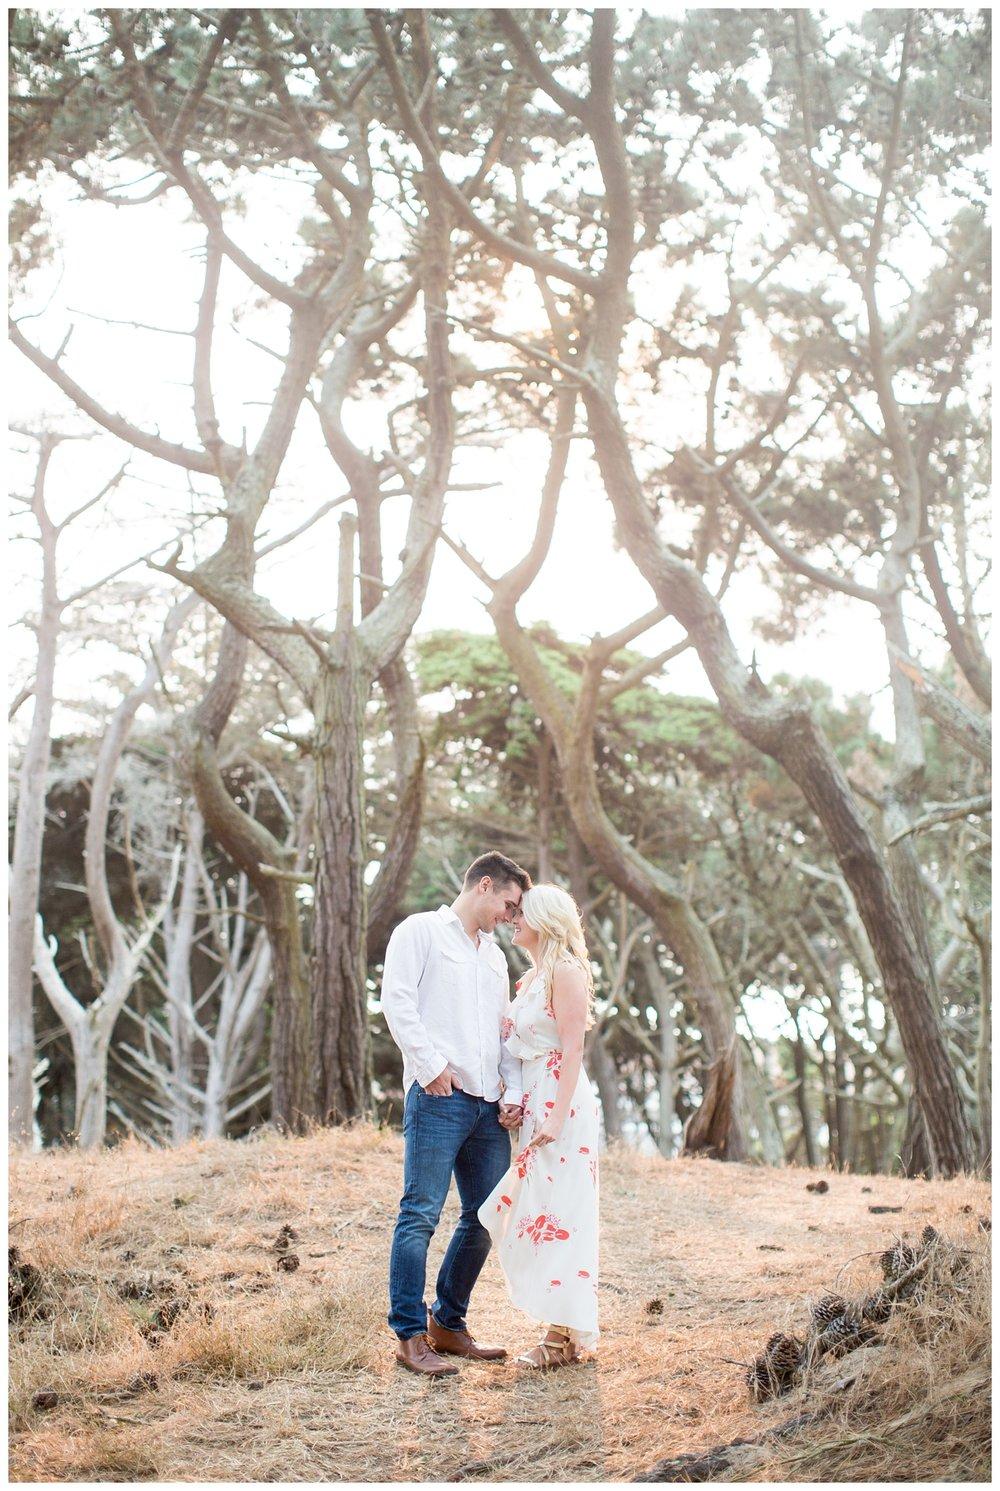 Baker-Beach-San-Francisco-Engagement-Photos_6375.jpg